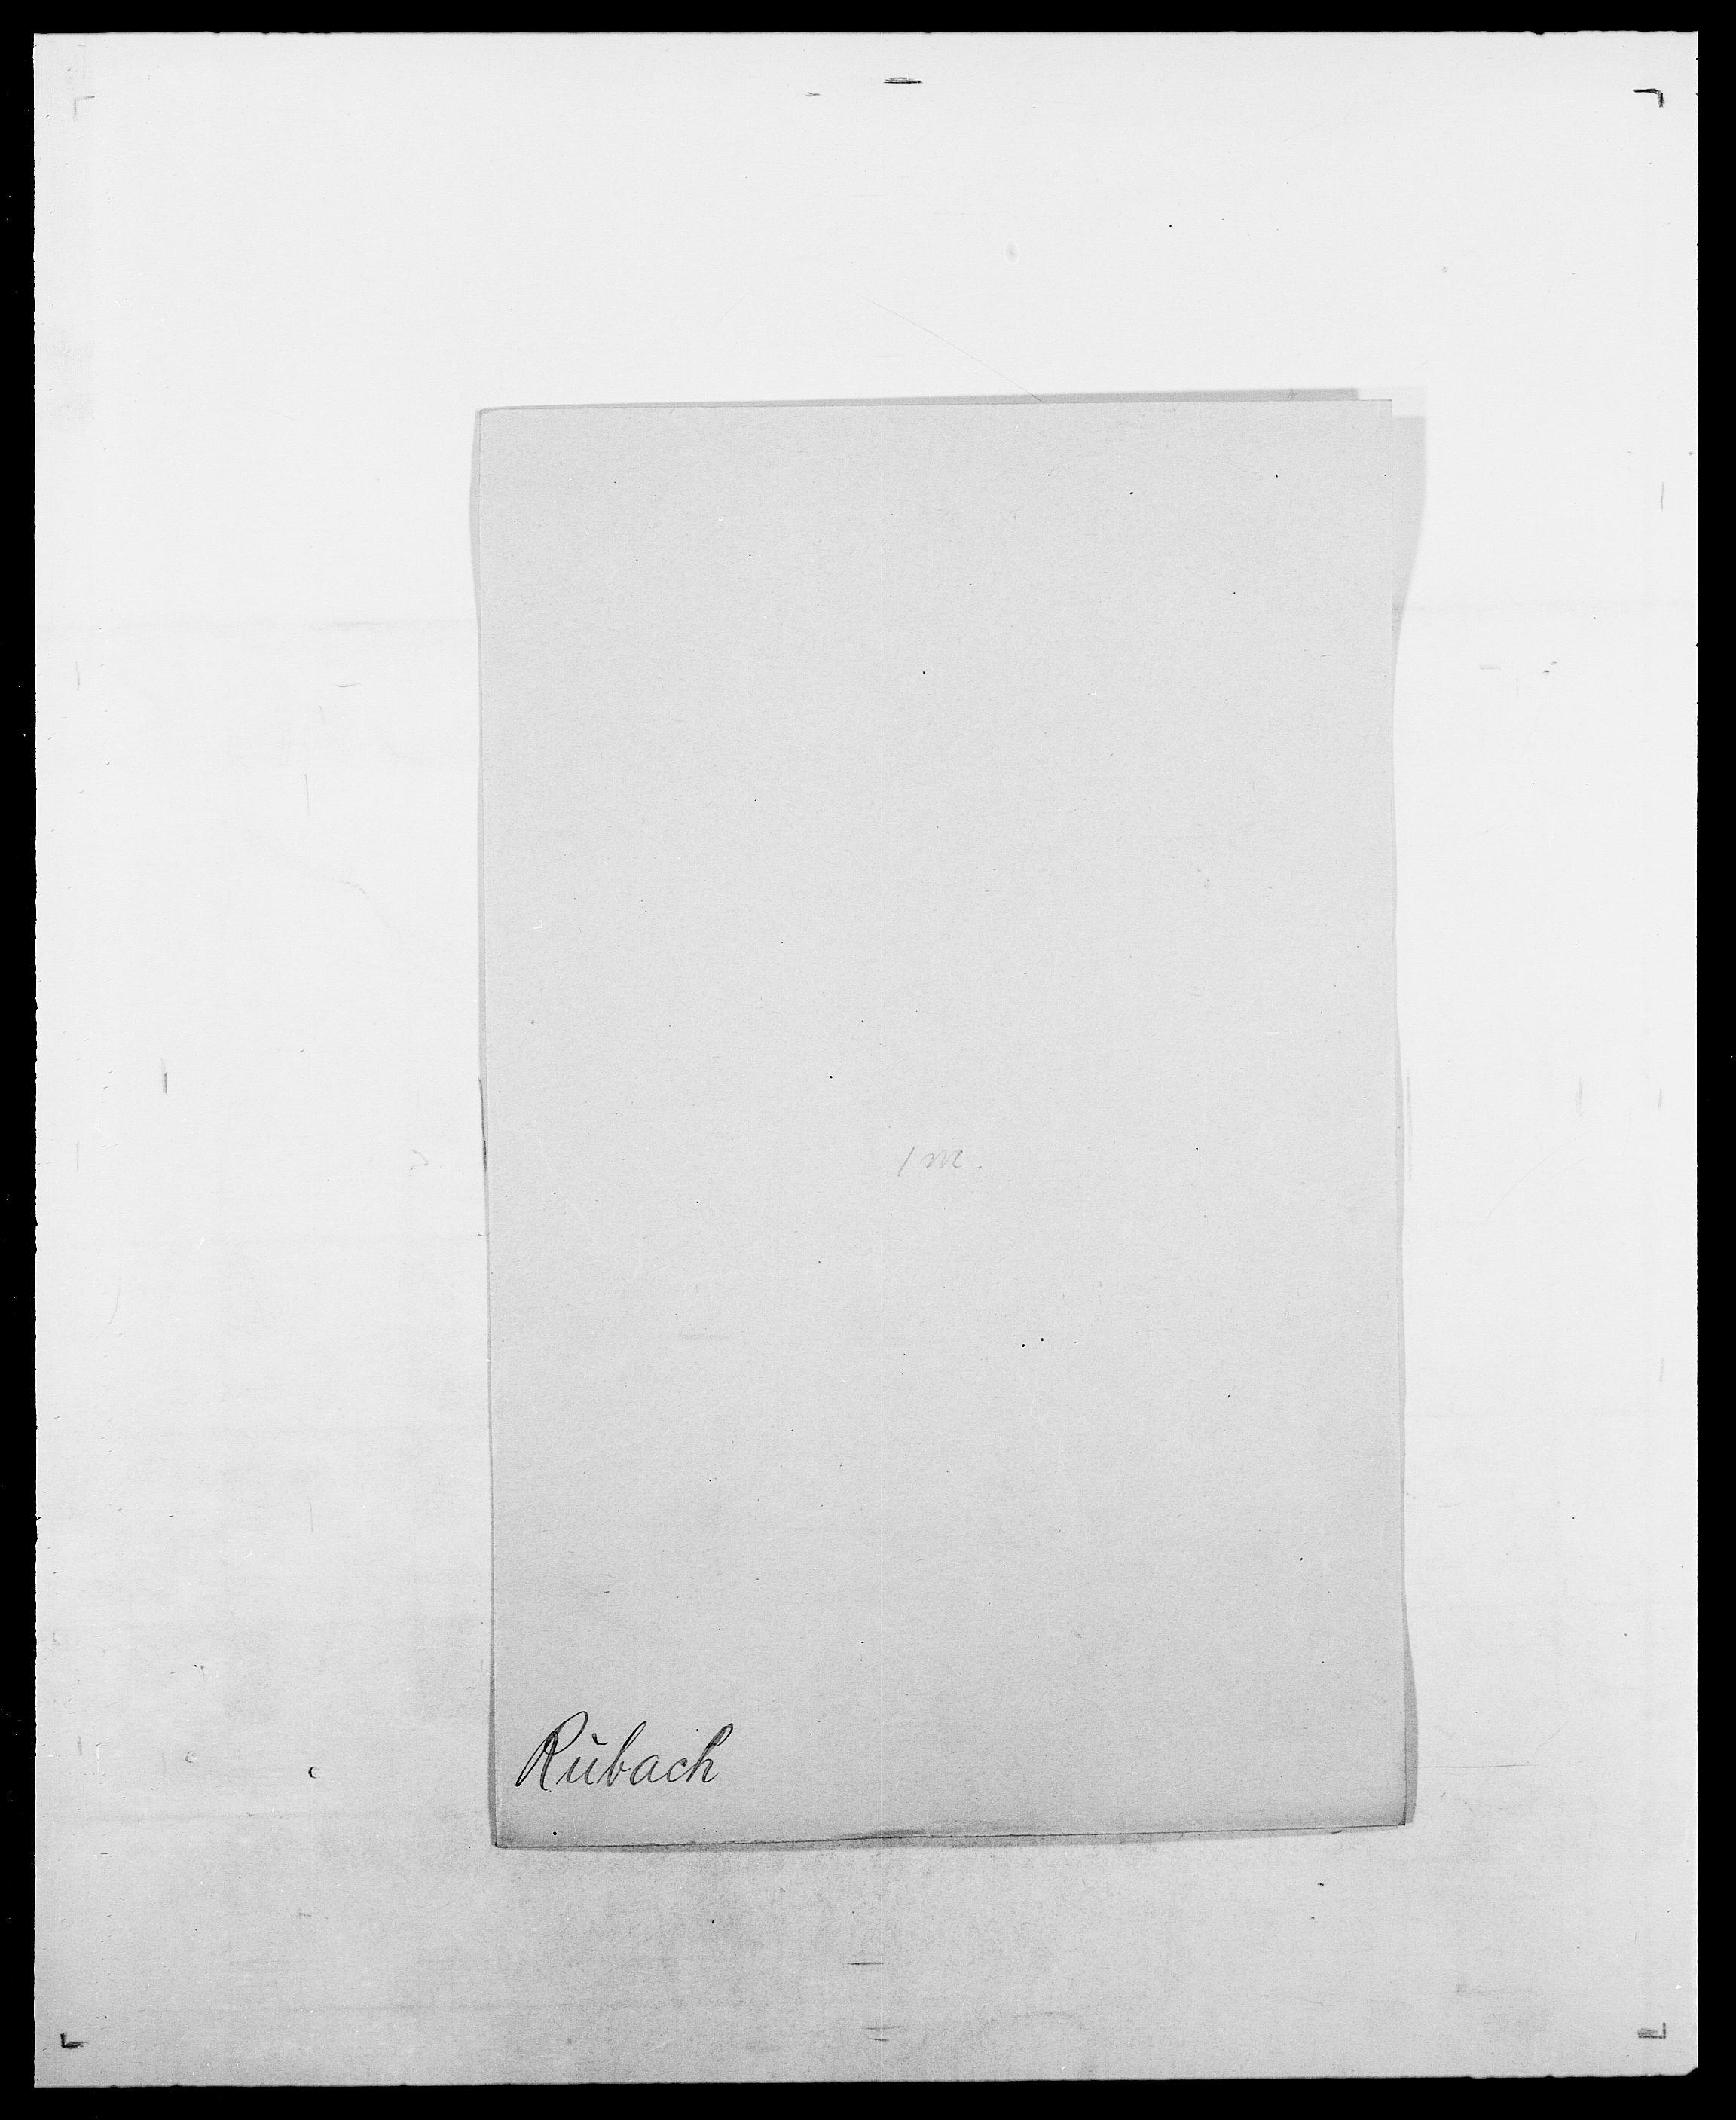 SAO, Delgobe, Charles Antoine - samling, D/Da/L0033: Roald - Røyem, s. 414